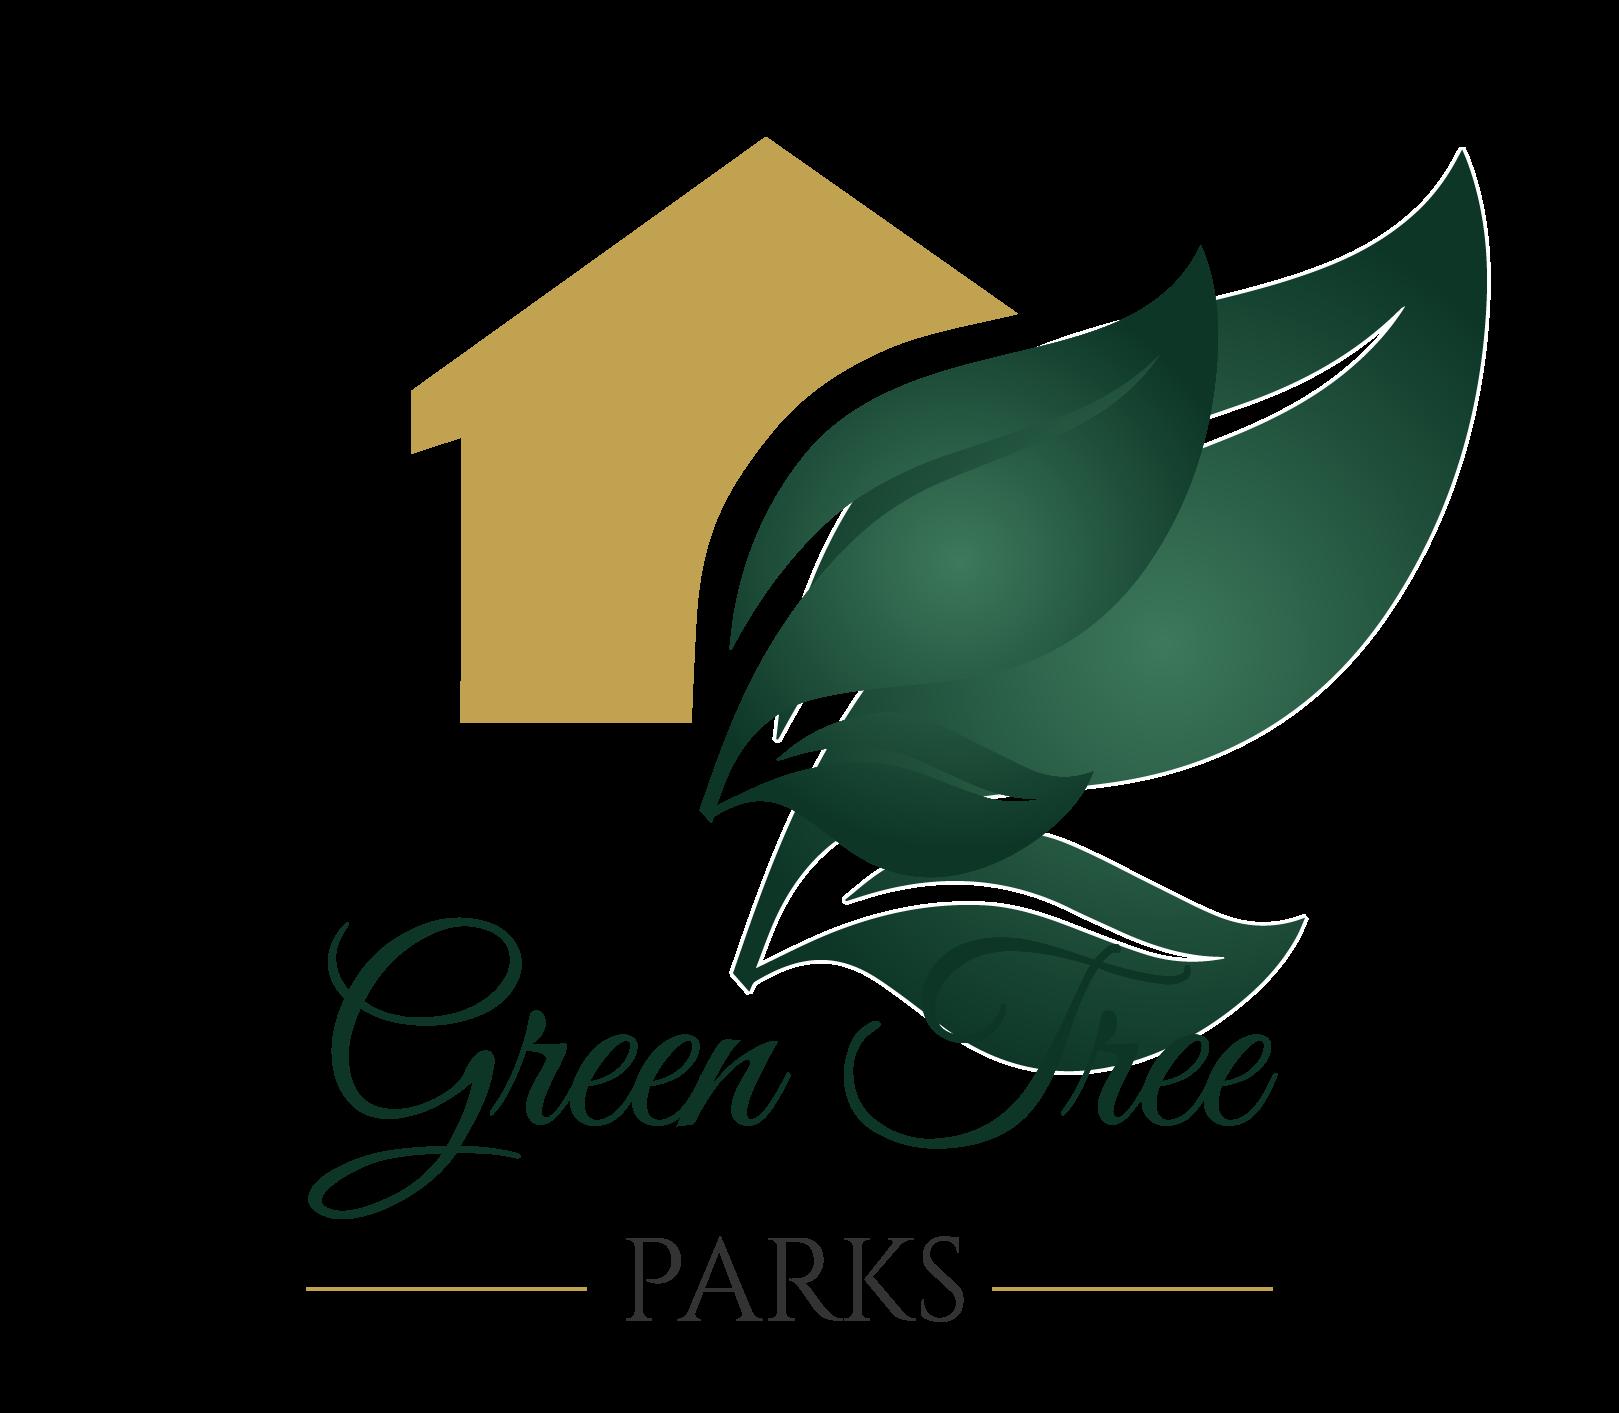 Green Tree Parks